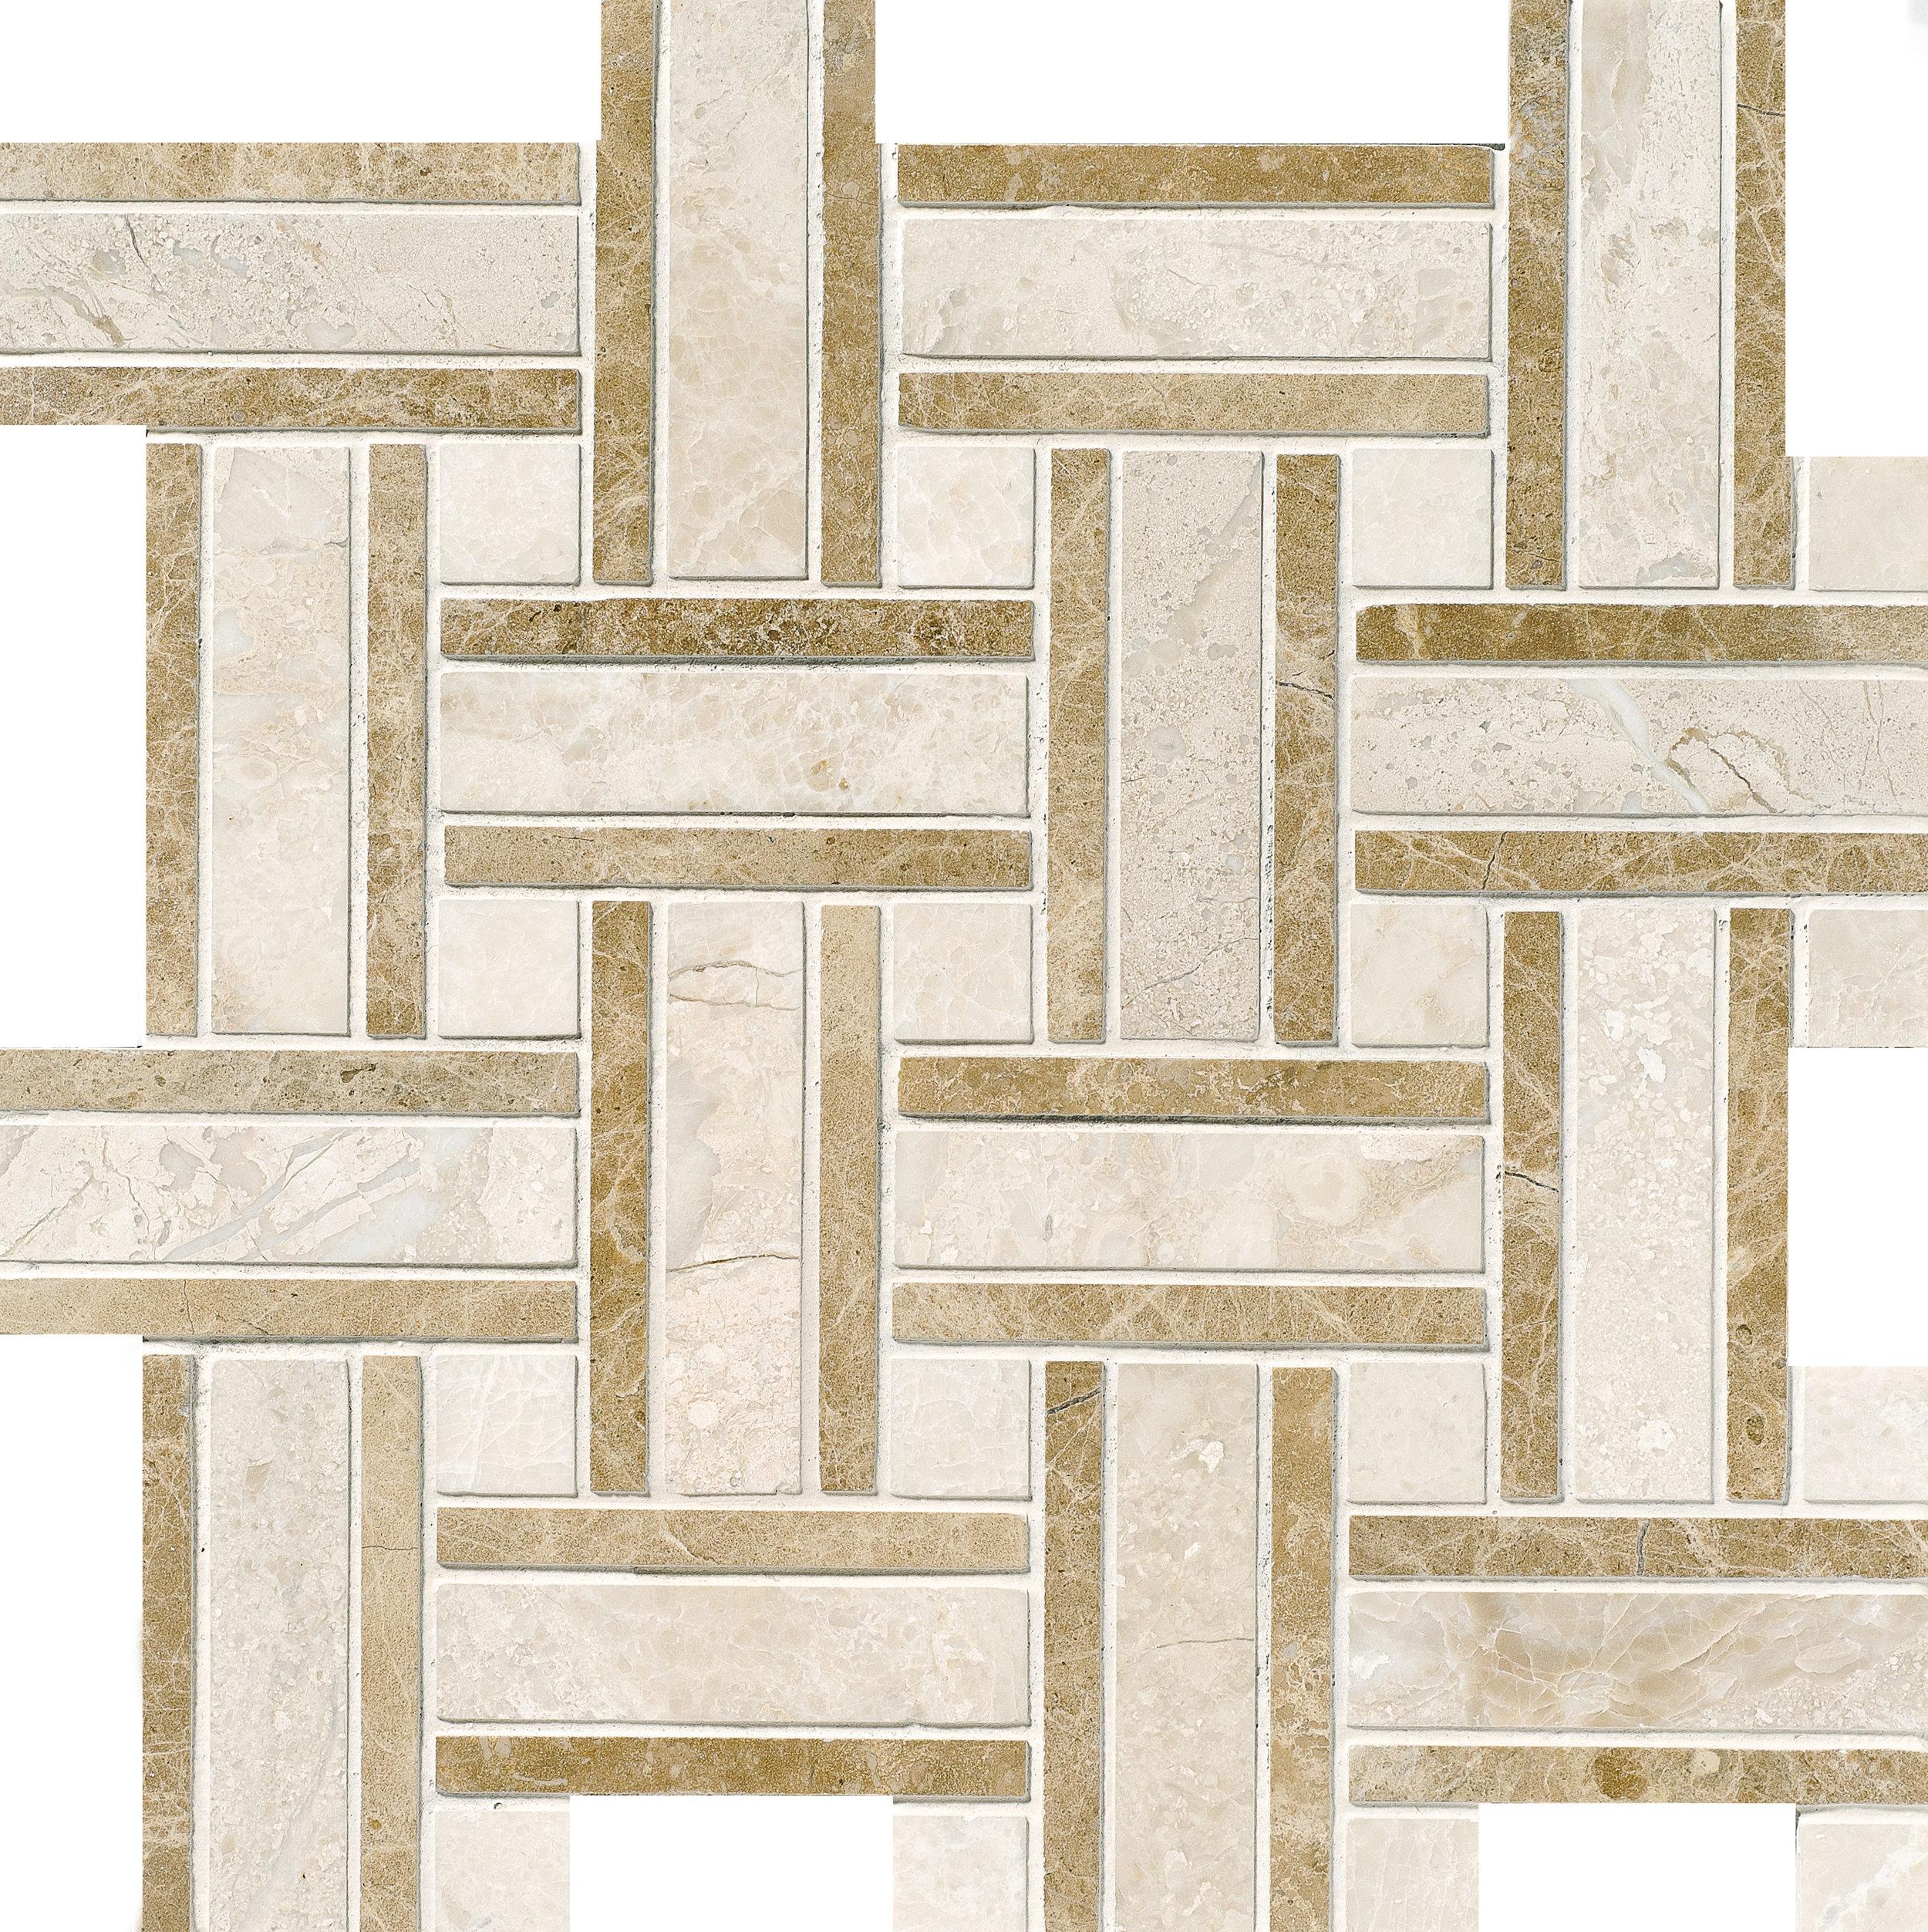 "MS01174 diana royal modern polished lattice mosaic 12""x12""x3/8"" sheets"